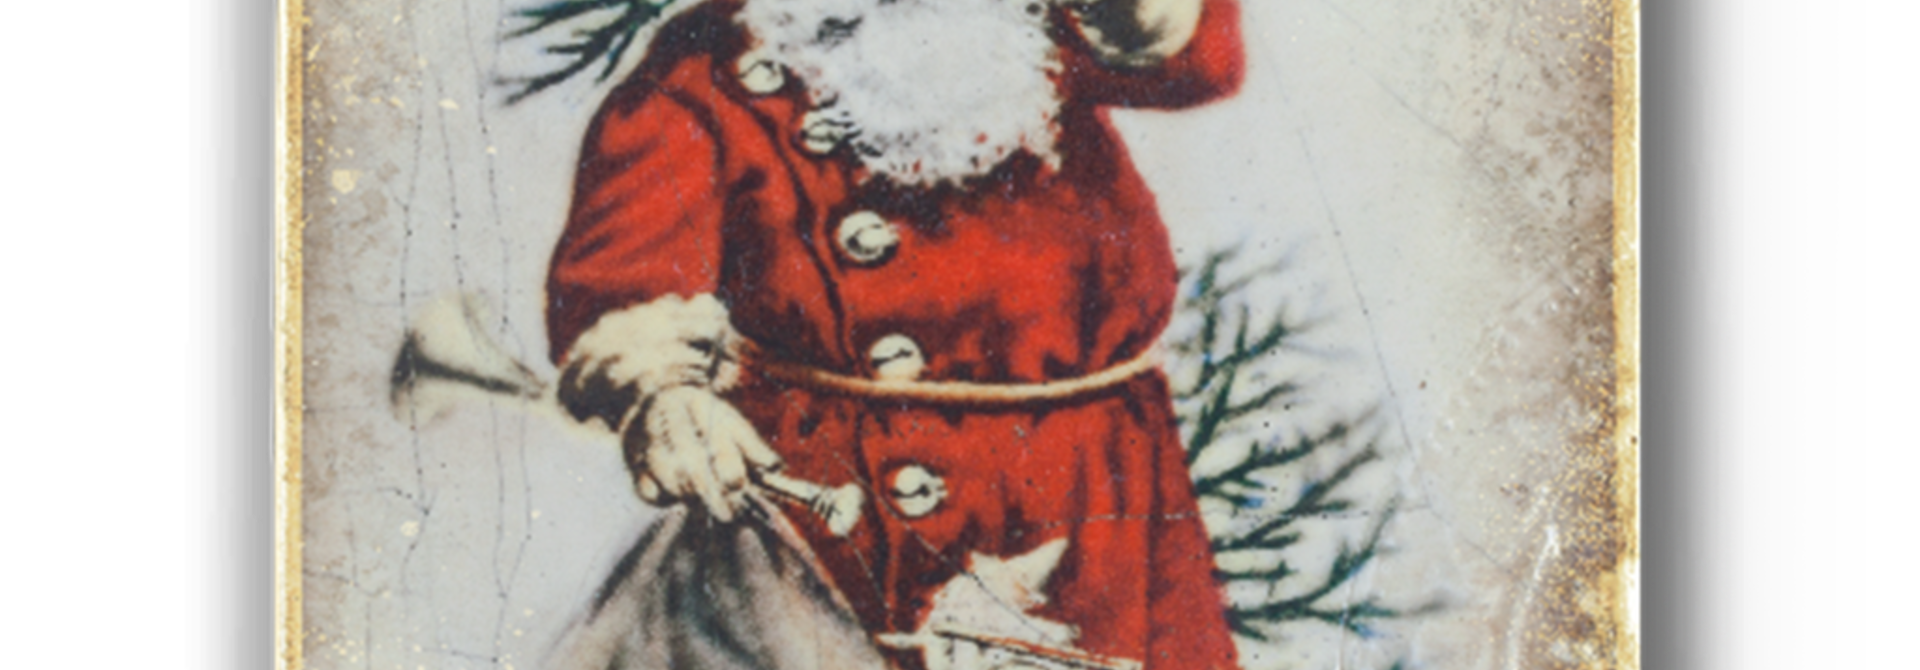 SID DICKENS - Santa Claus Frames